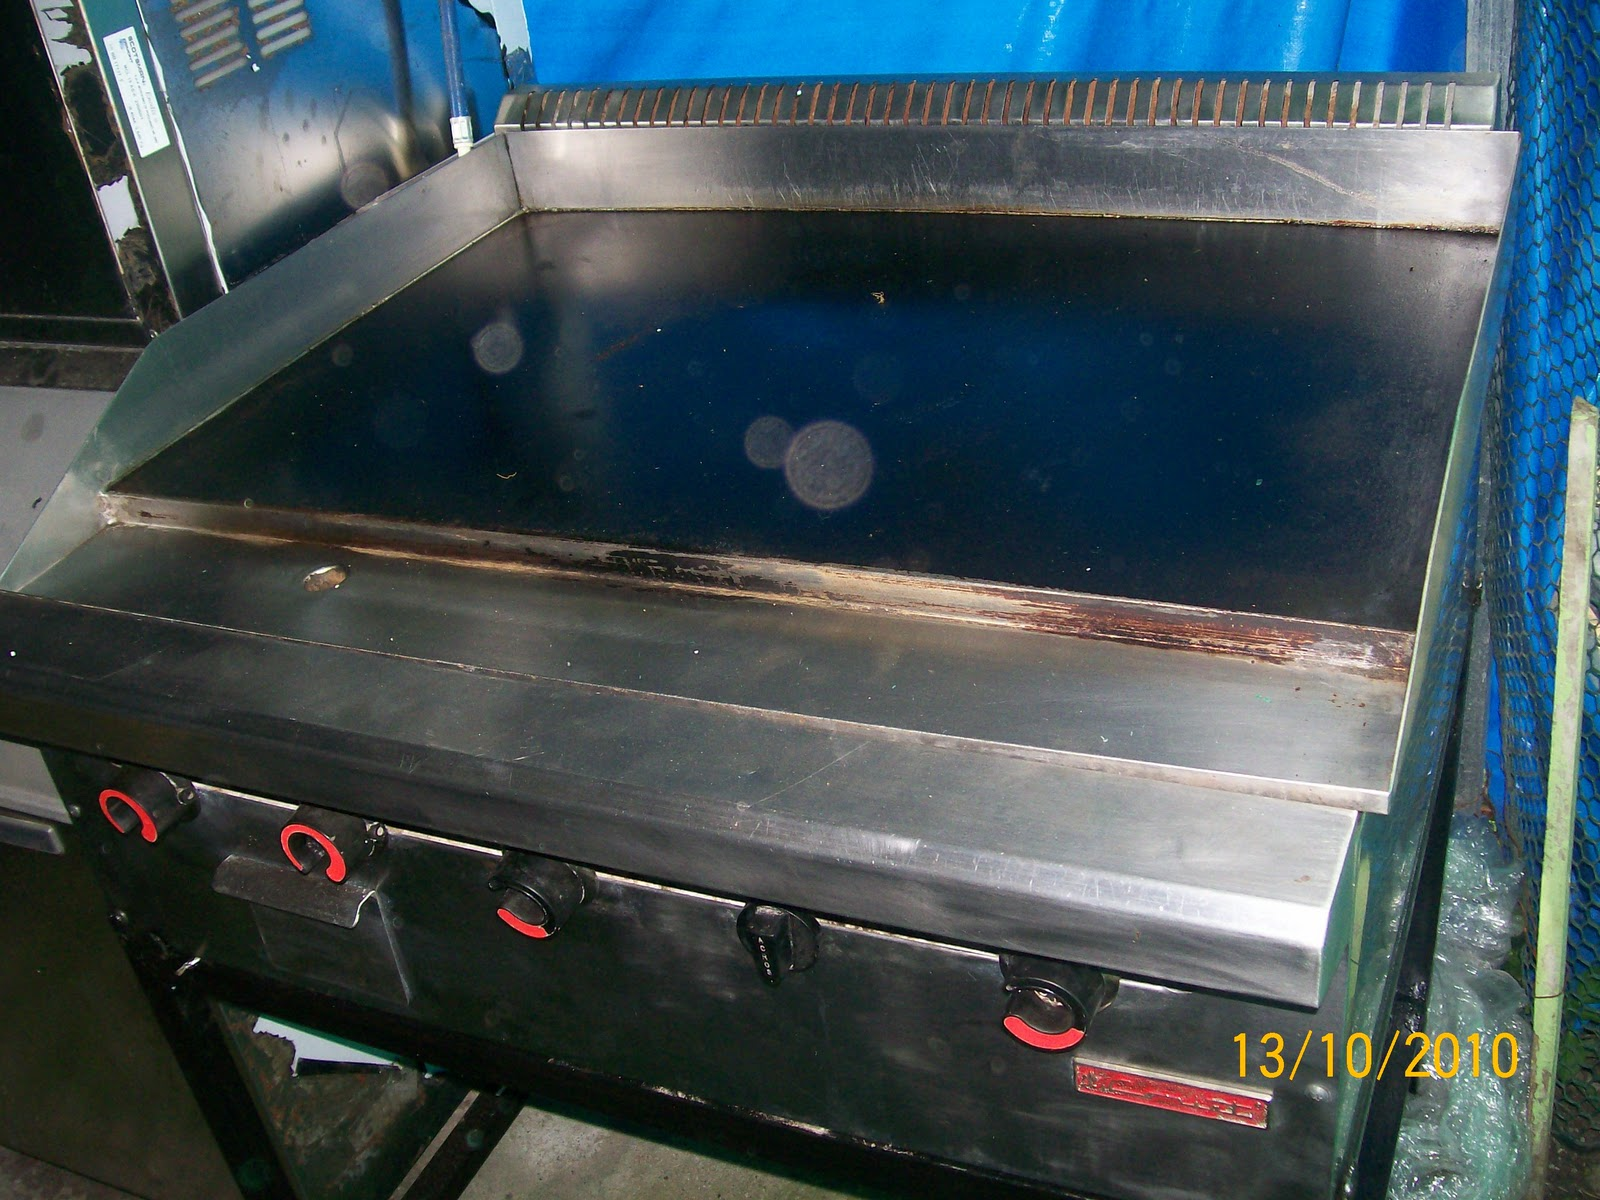 Equipos de cocina plancha for Equipos de cocina de segunda